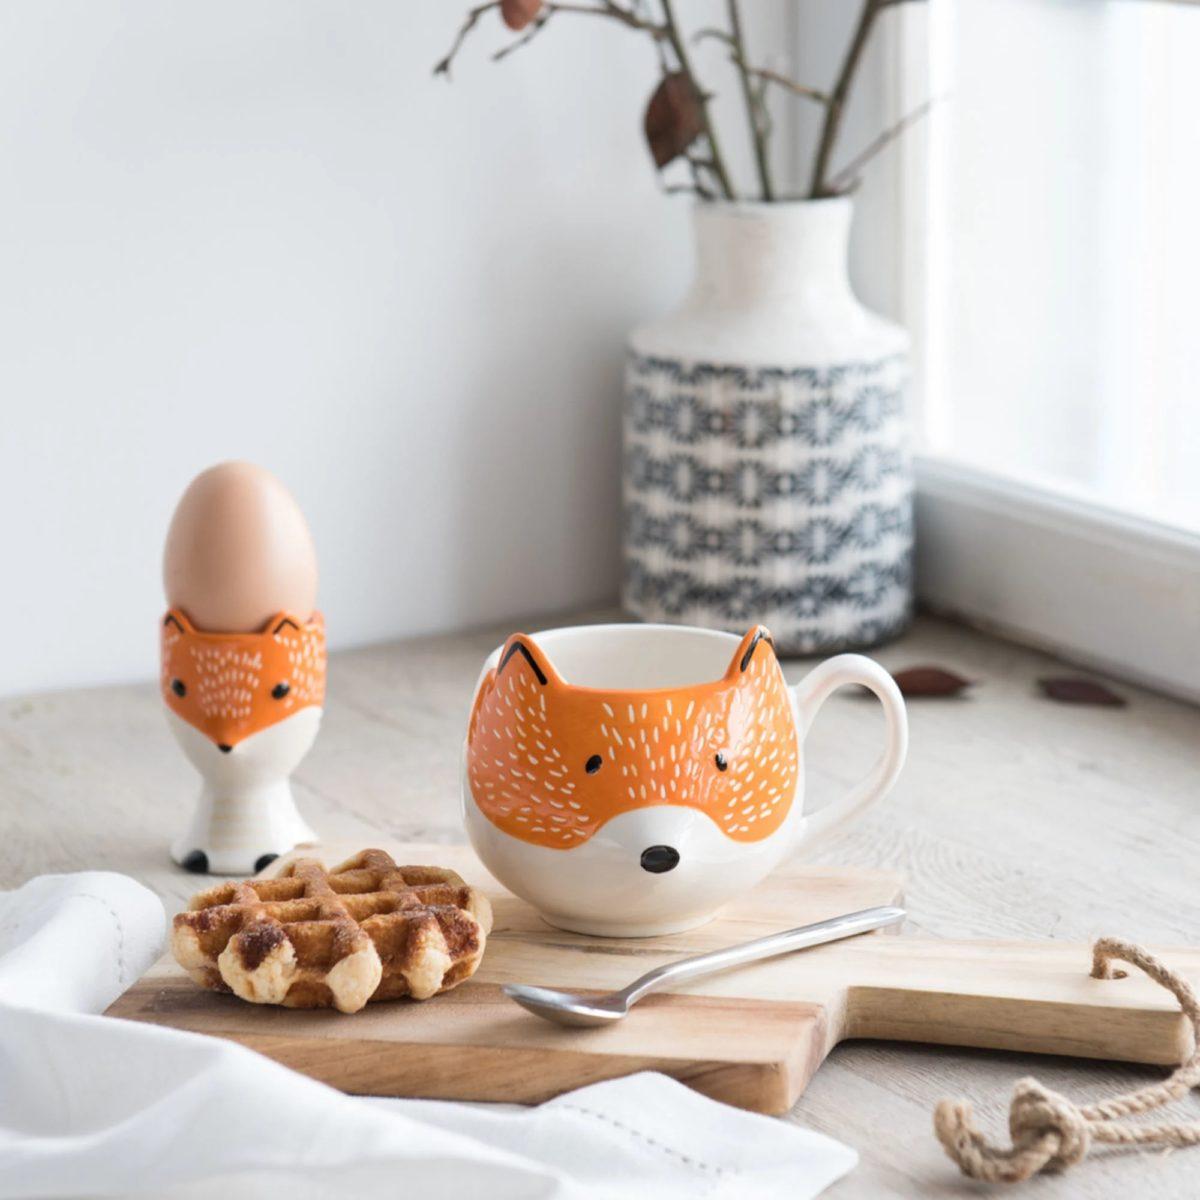 maisons-du-monde-natale-2019-collezione-natural-christmas-tazza-volpe-in-maiolica